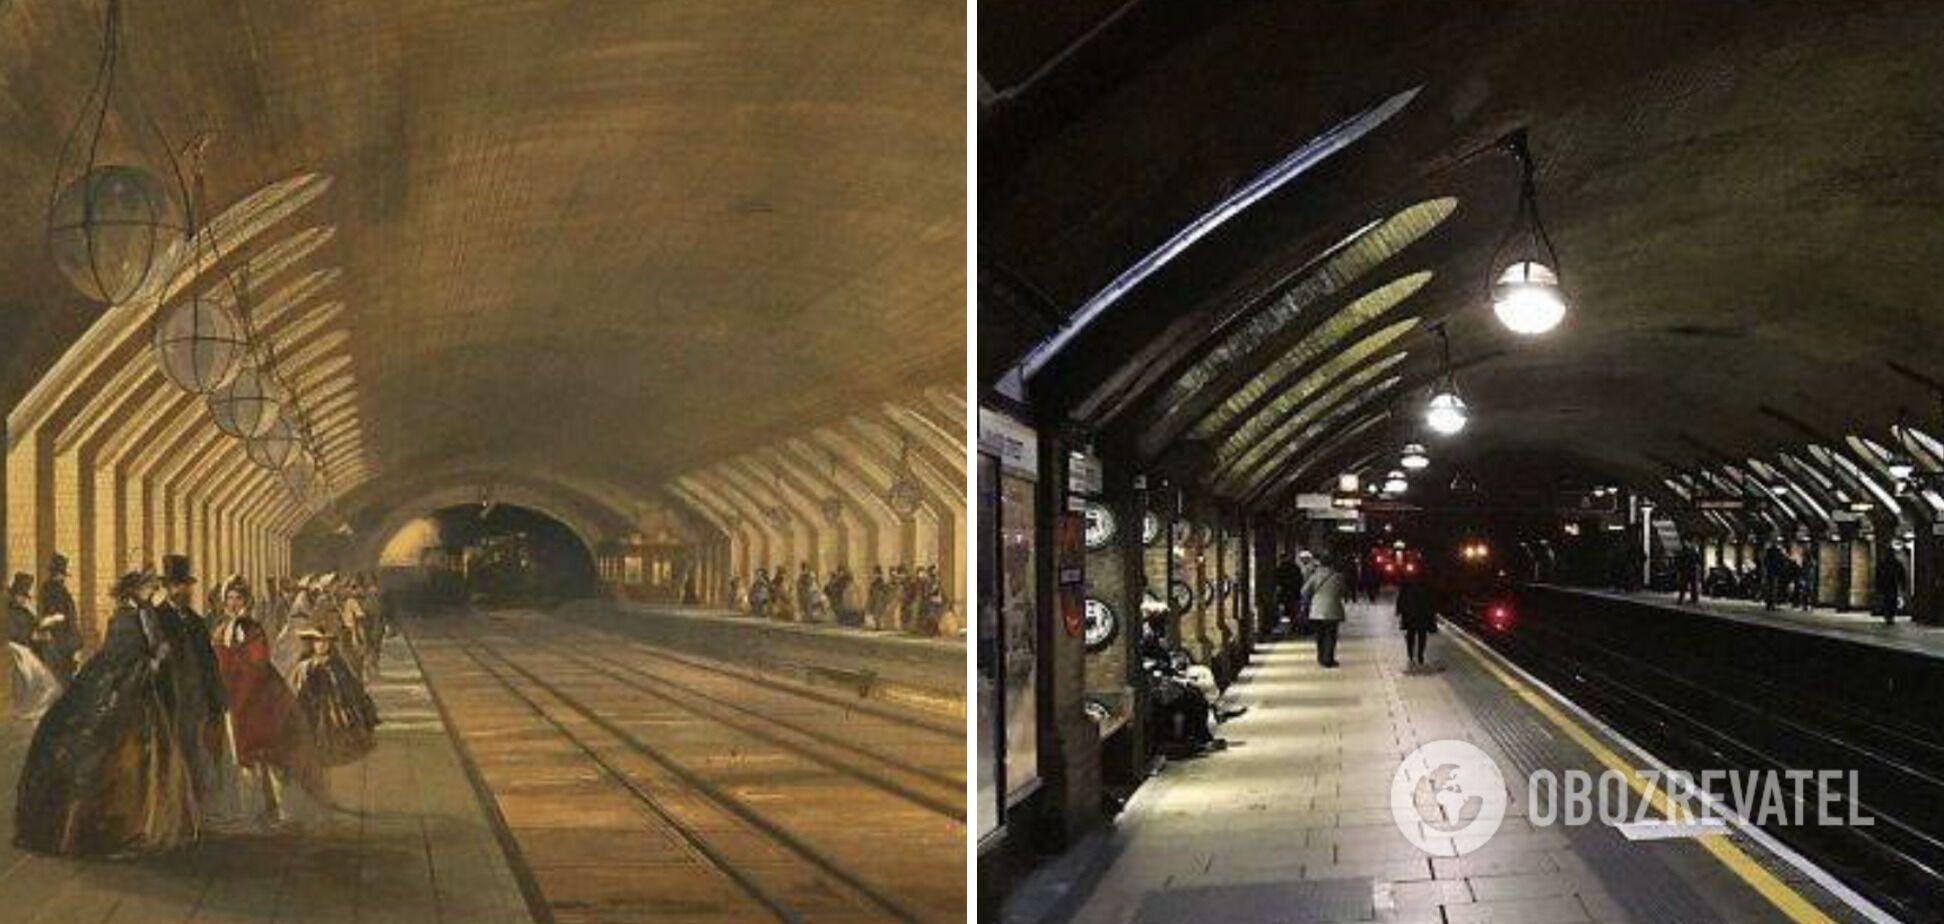 Самая старая станция метро 157 лет назад и сейчас